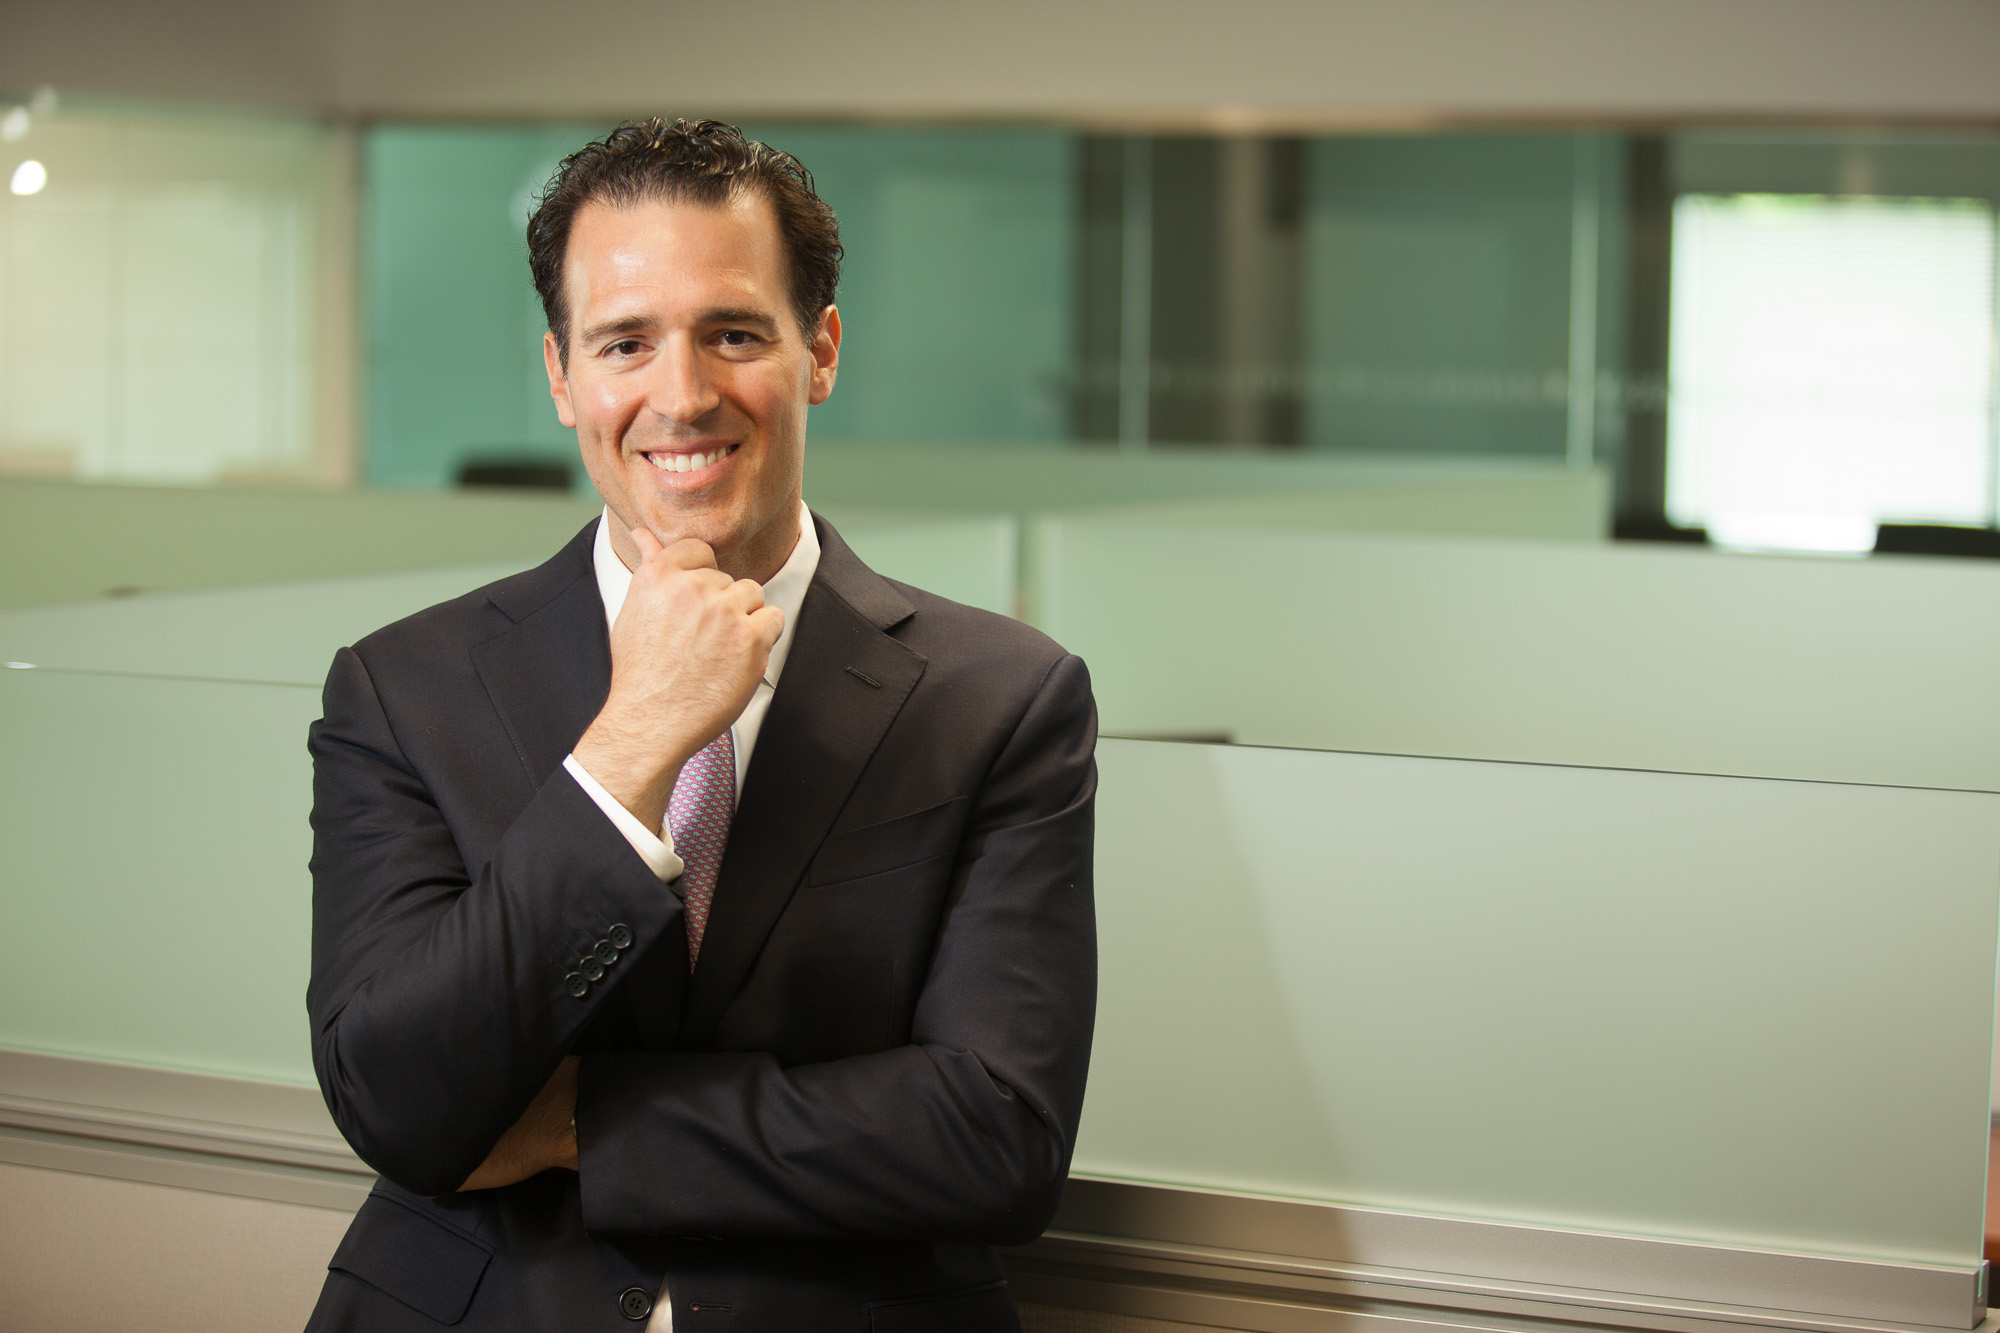 Smiling Corporate Headshot